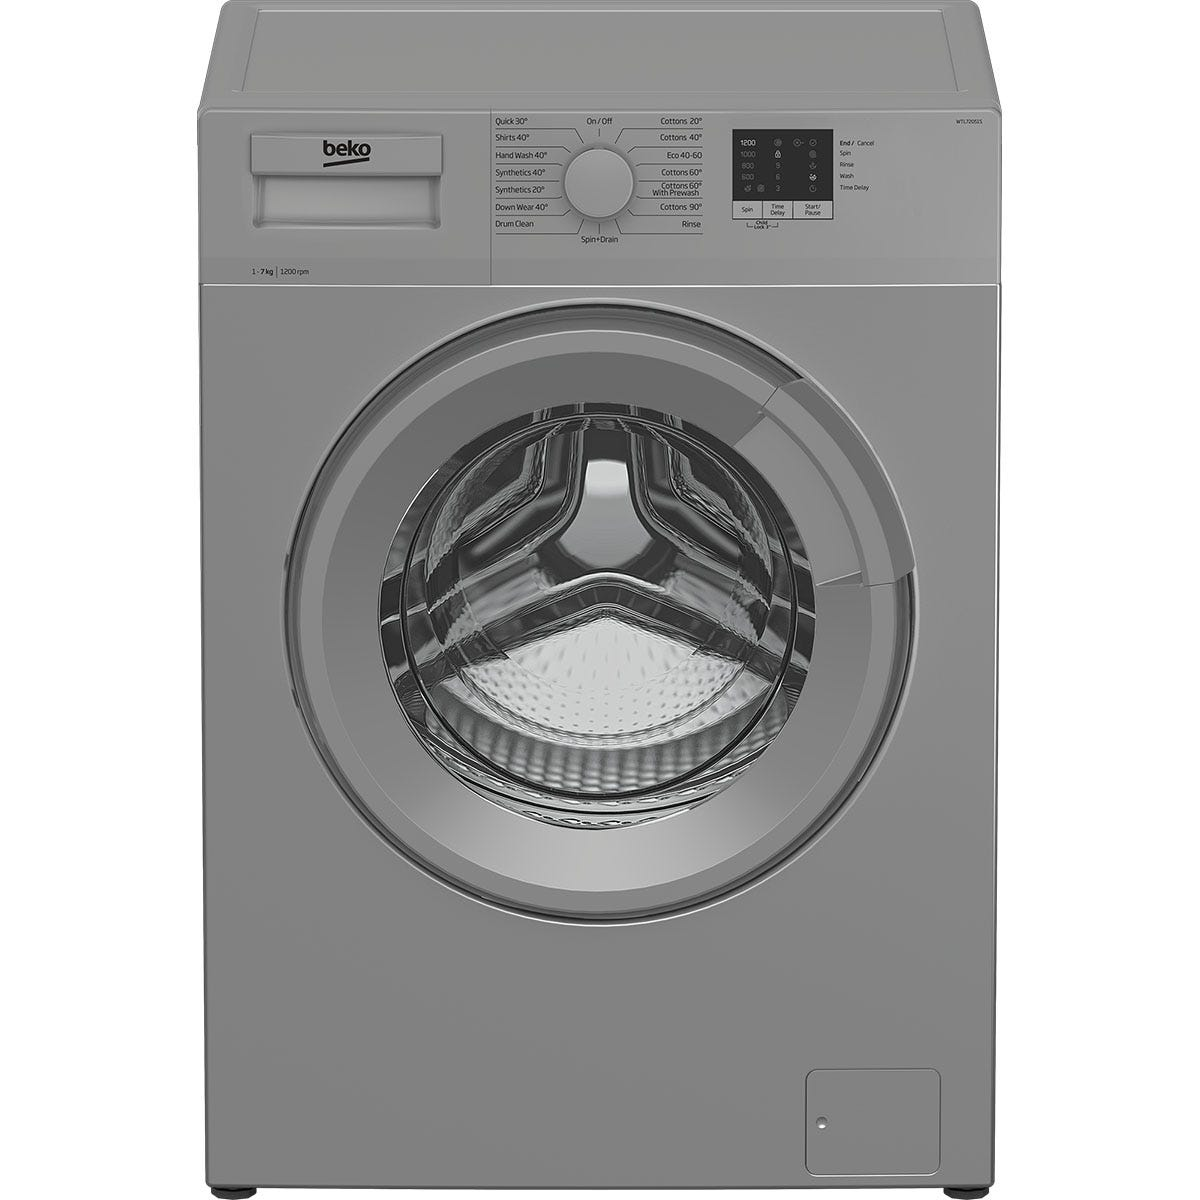 Beko WTL72051S 7kg 1200rpm Freestanding Washing Machine - Silver